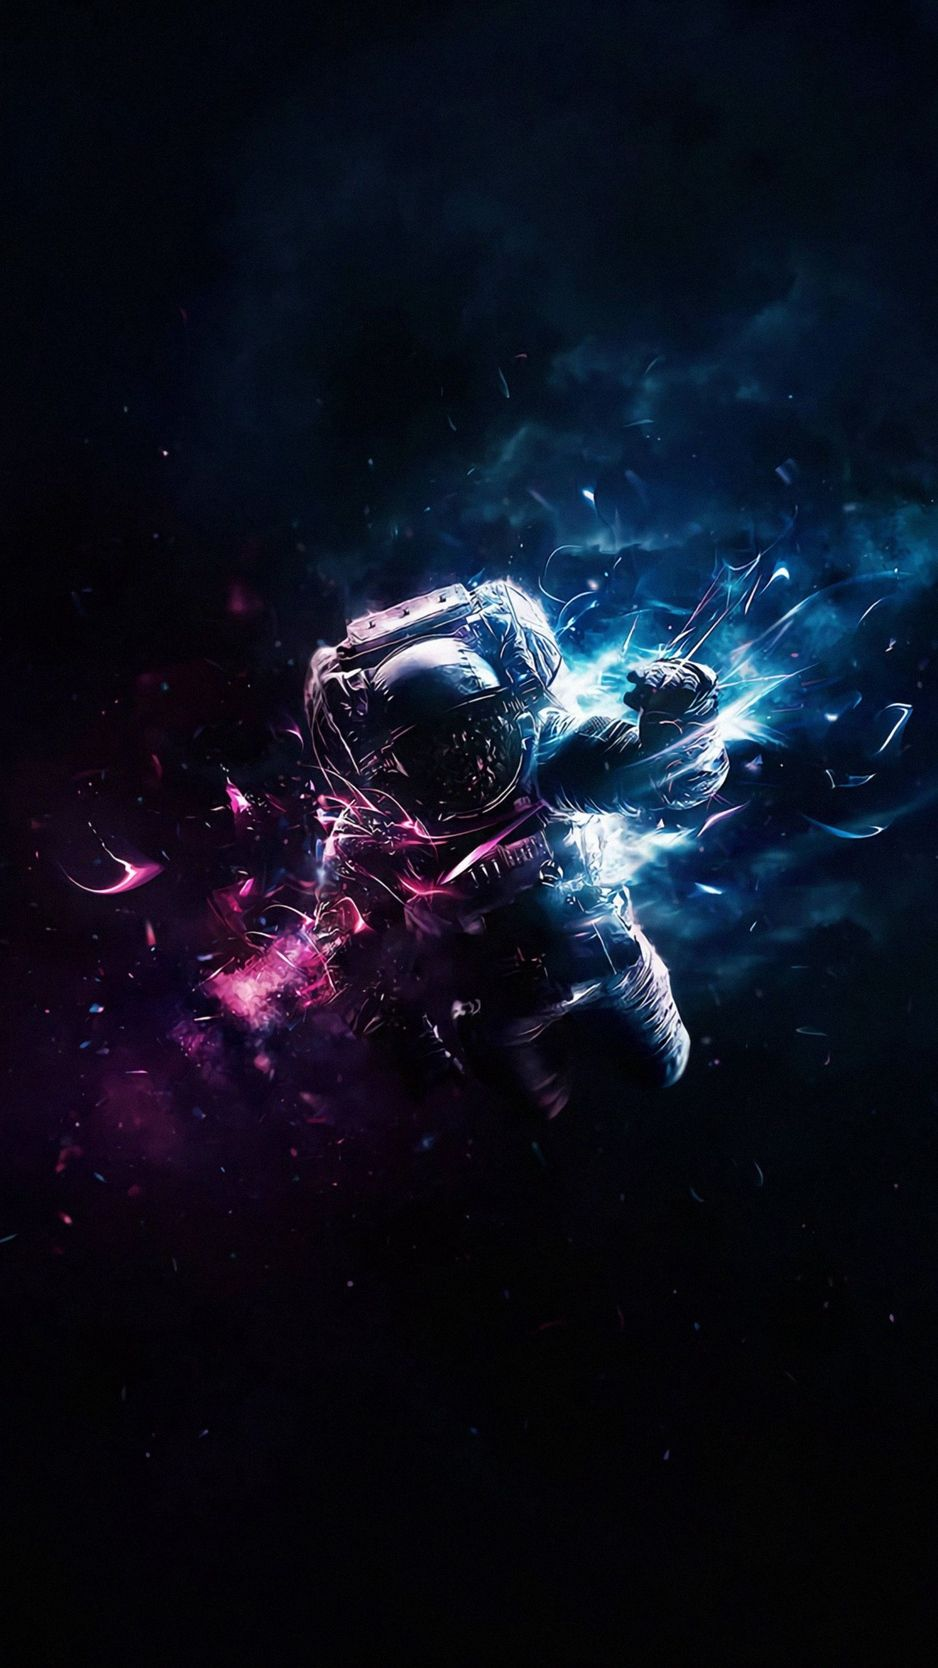 Cosmonaut, astronaut, art, space, flight, gravity